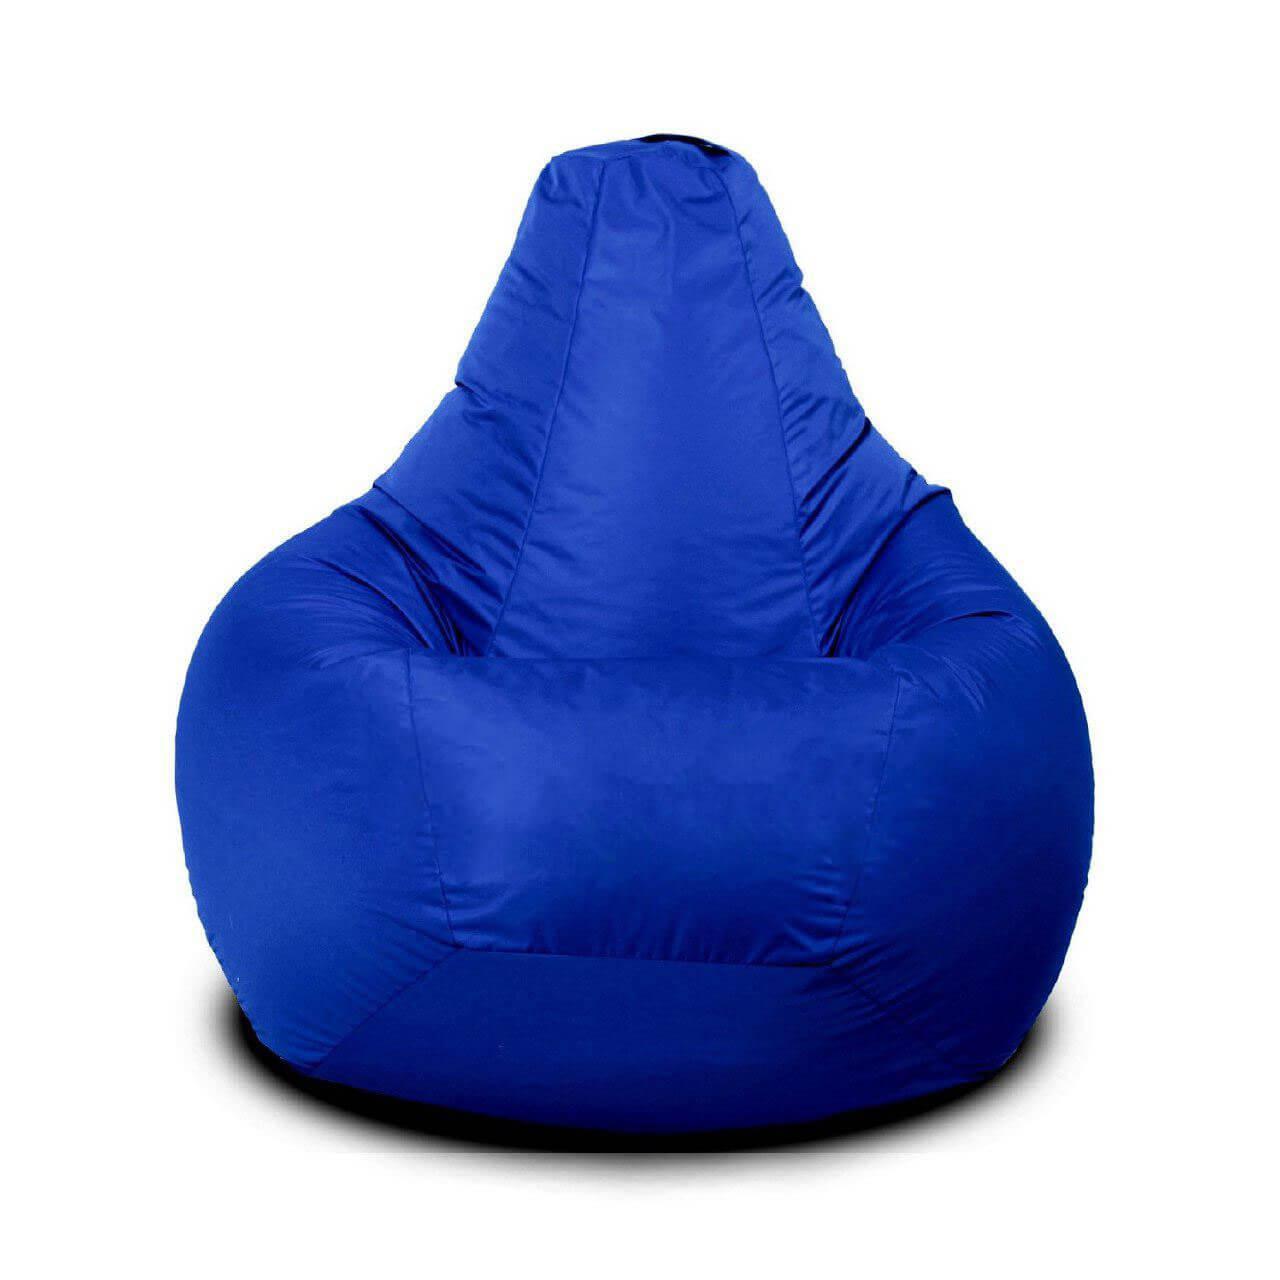 Кресло-груша KatyPuf Синее нейлон OXFORD, Размер XXL 140x100